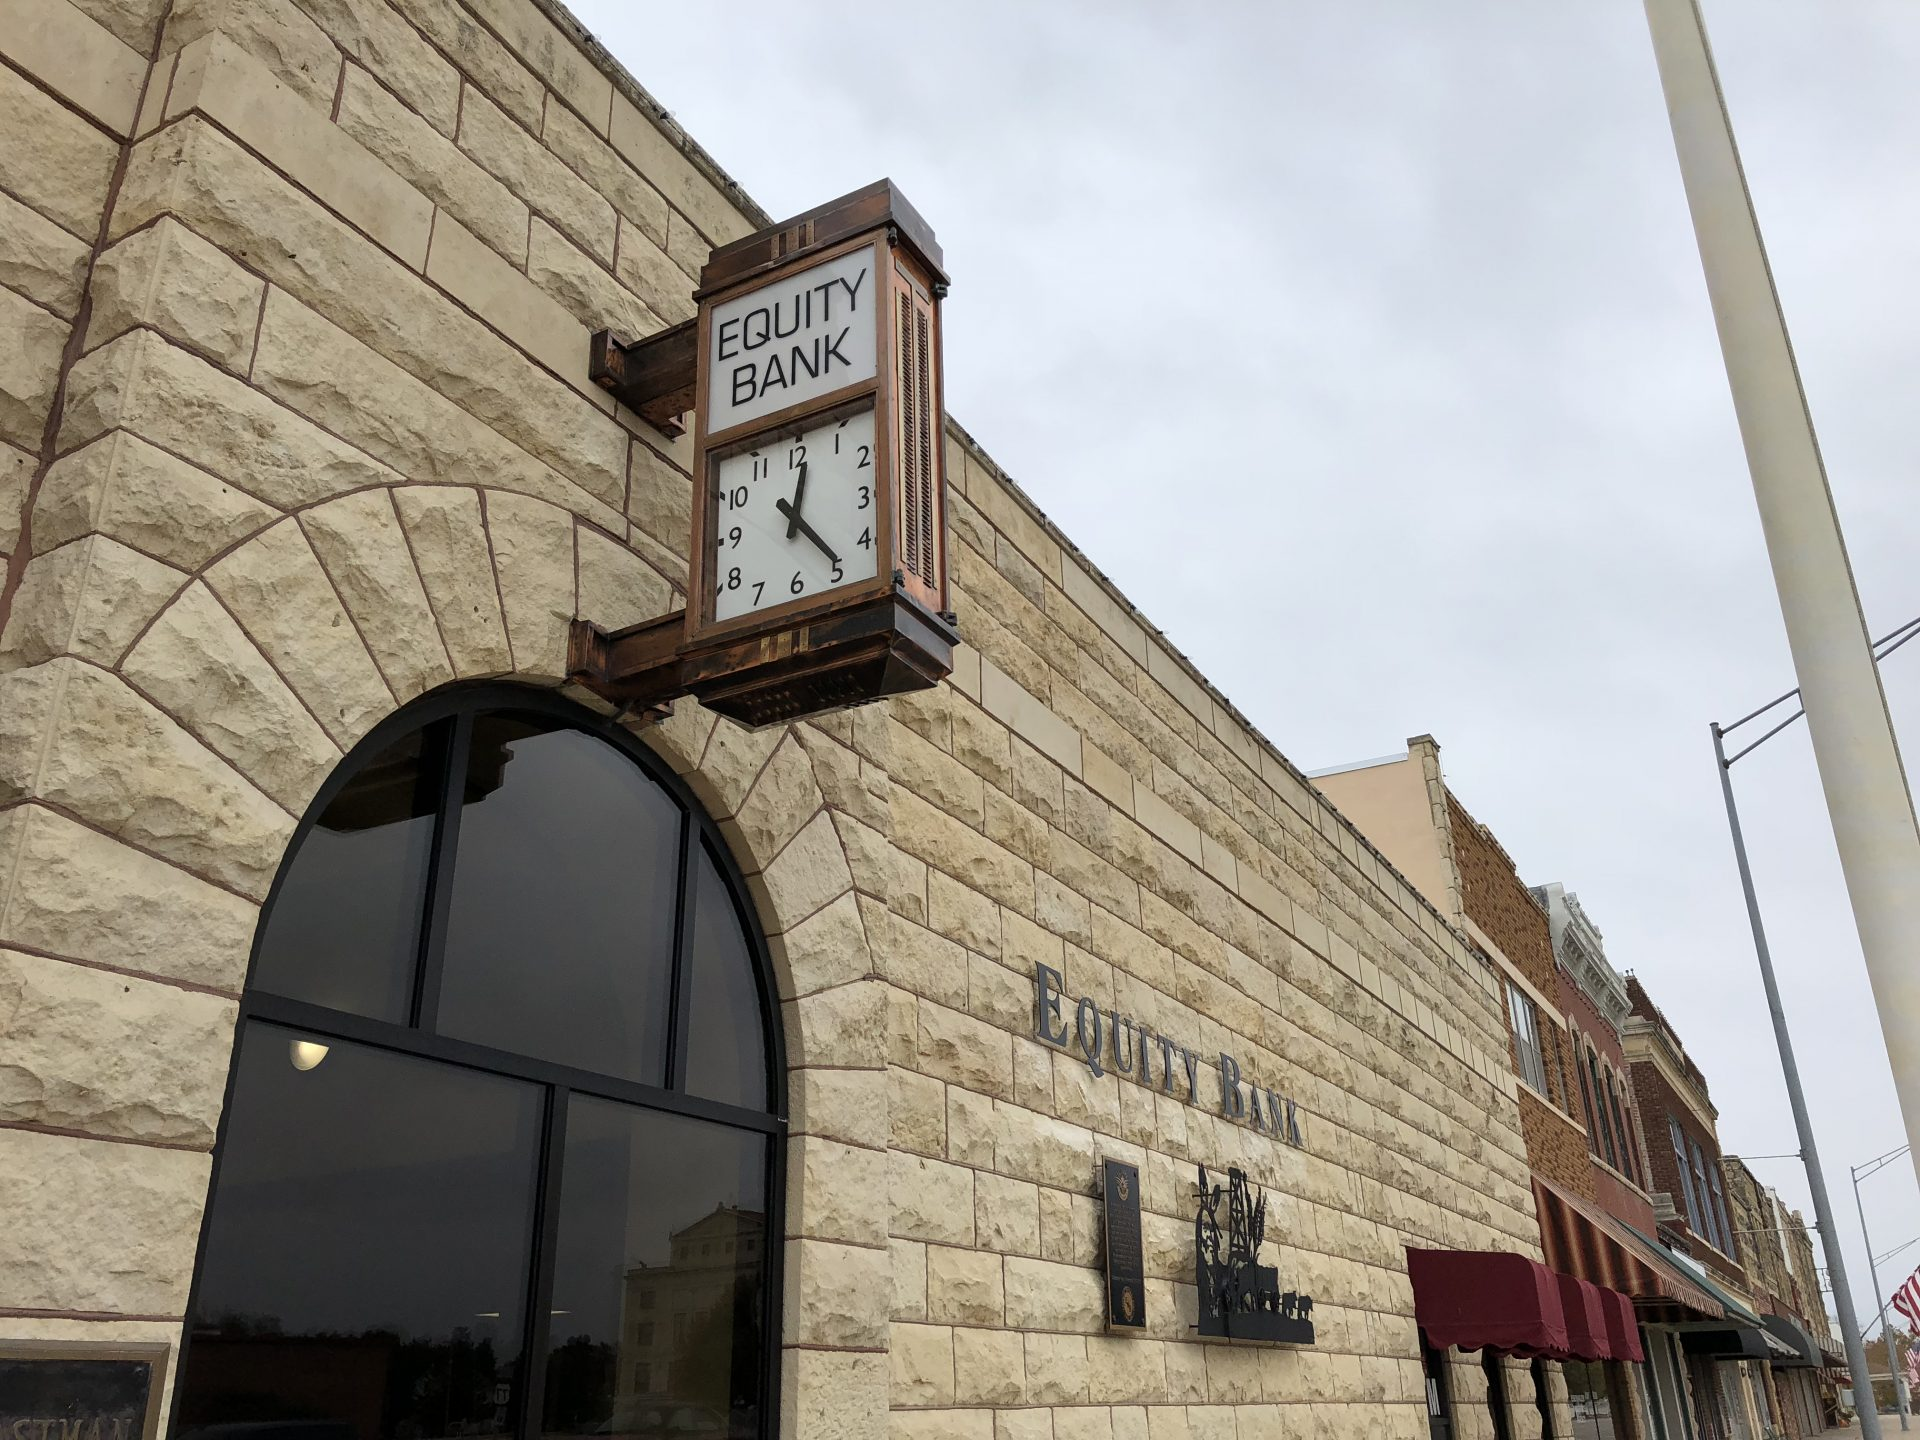 Equity Bank Newkirk branch exterior.